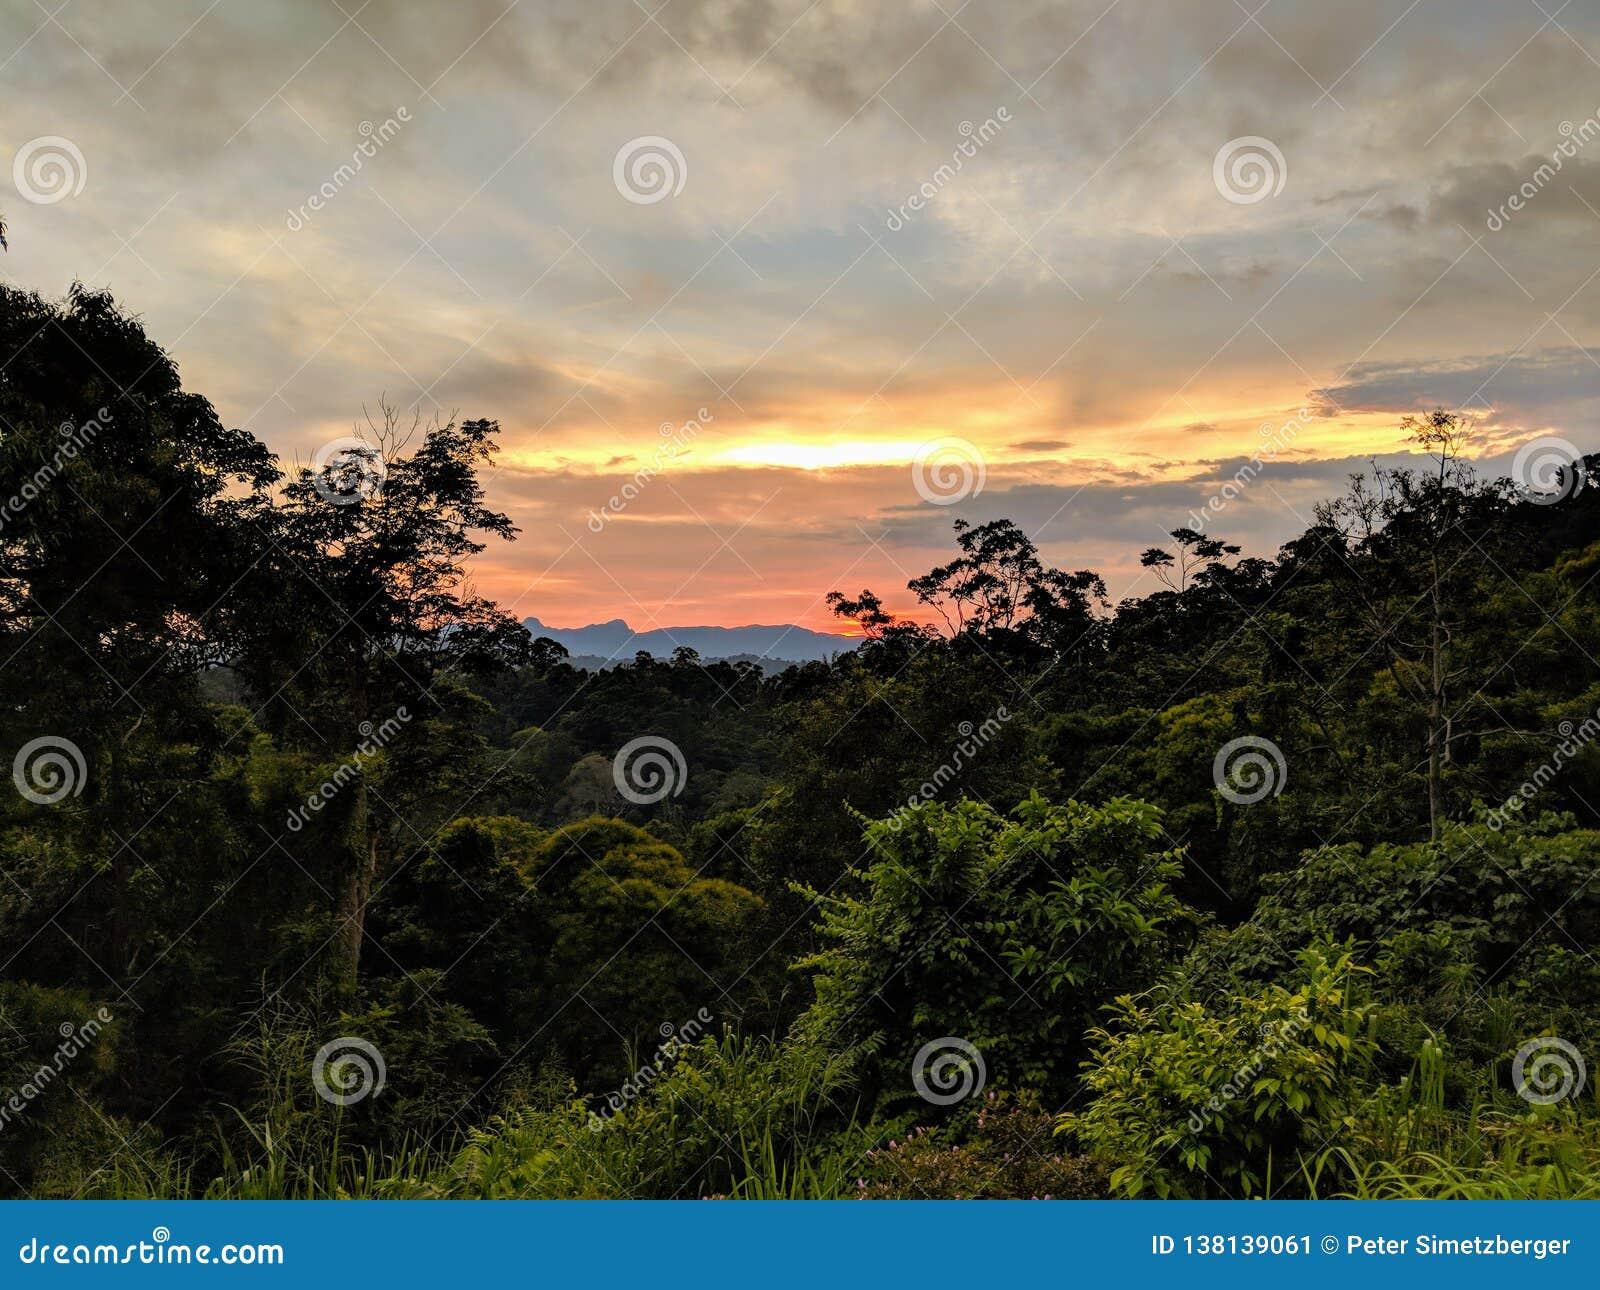 Piękny zmierzch nad ciemną dżunglą